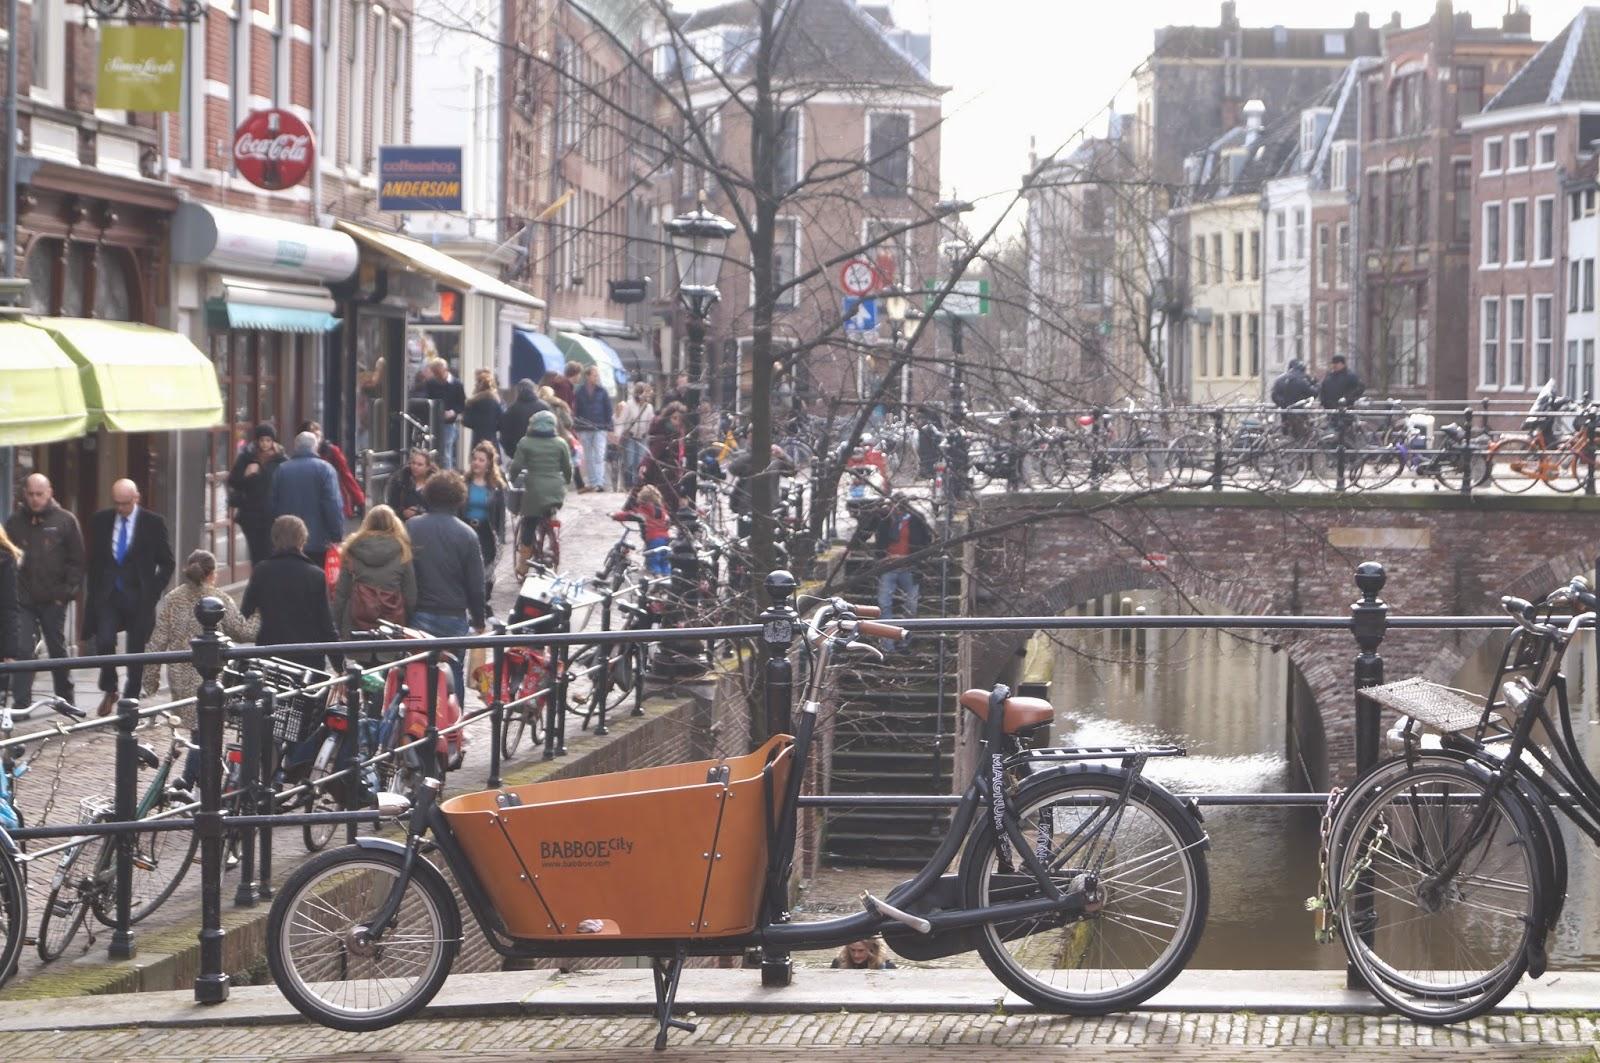 Utrecht, je bent zo ontzettend mooi.